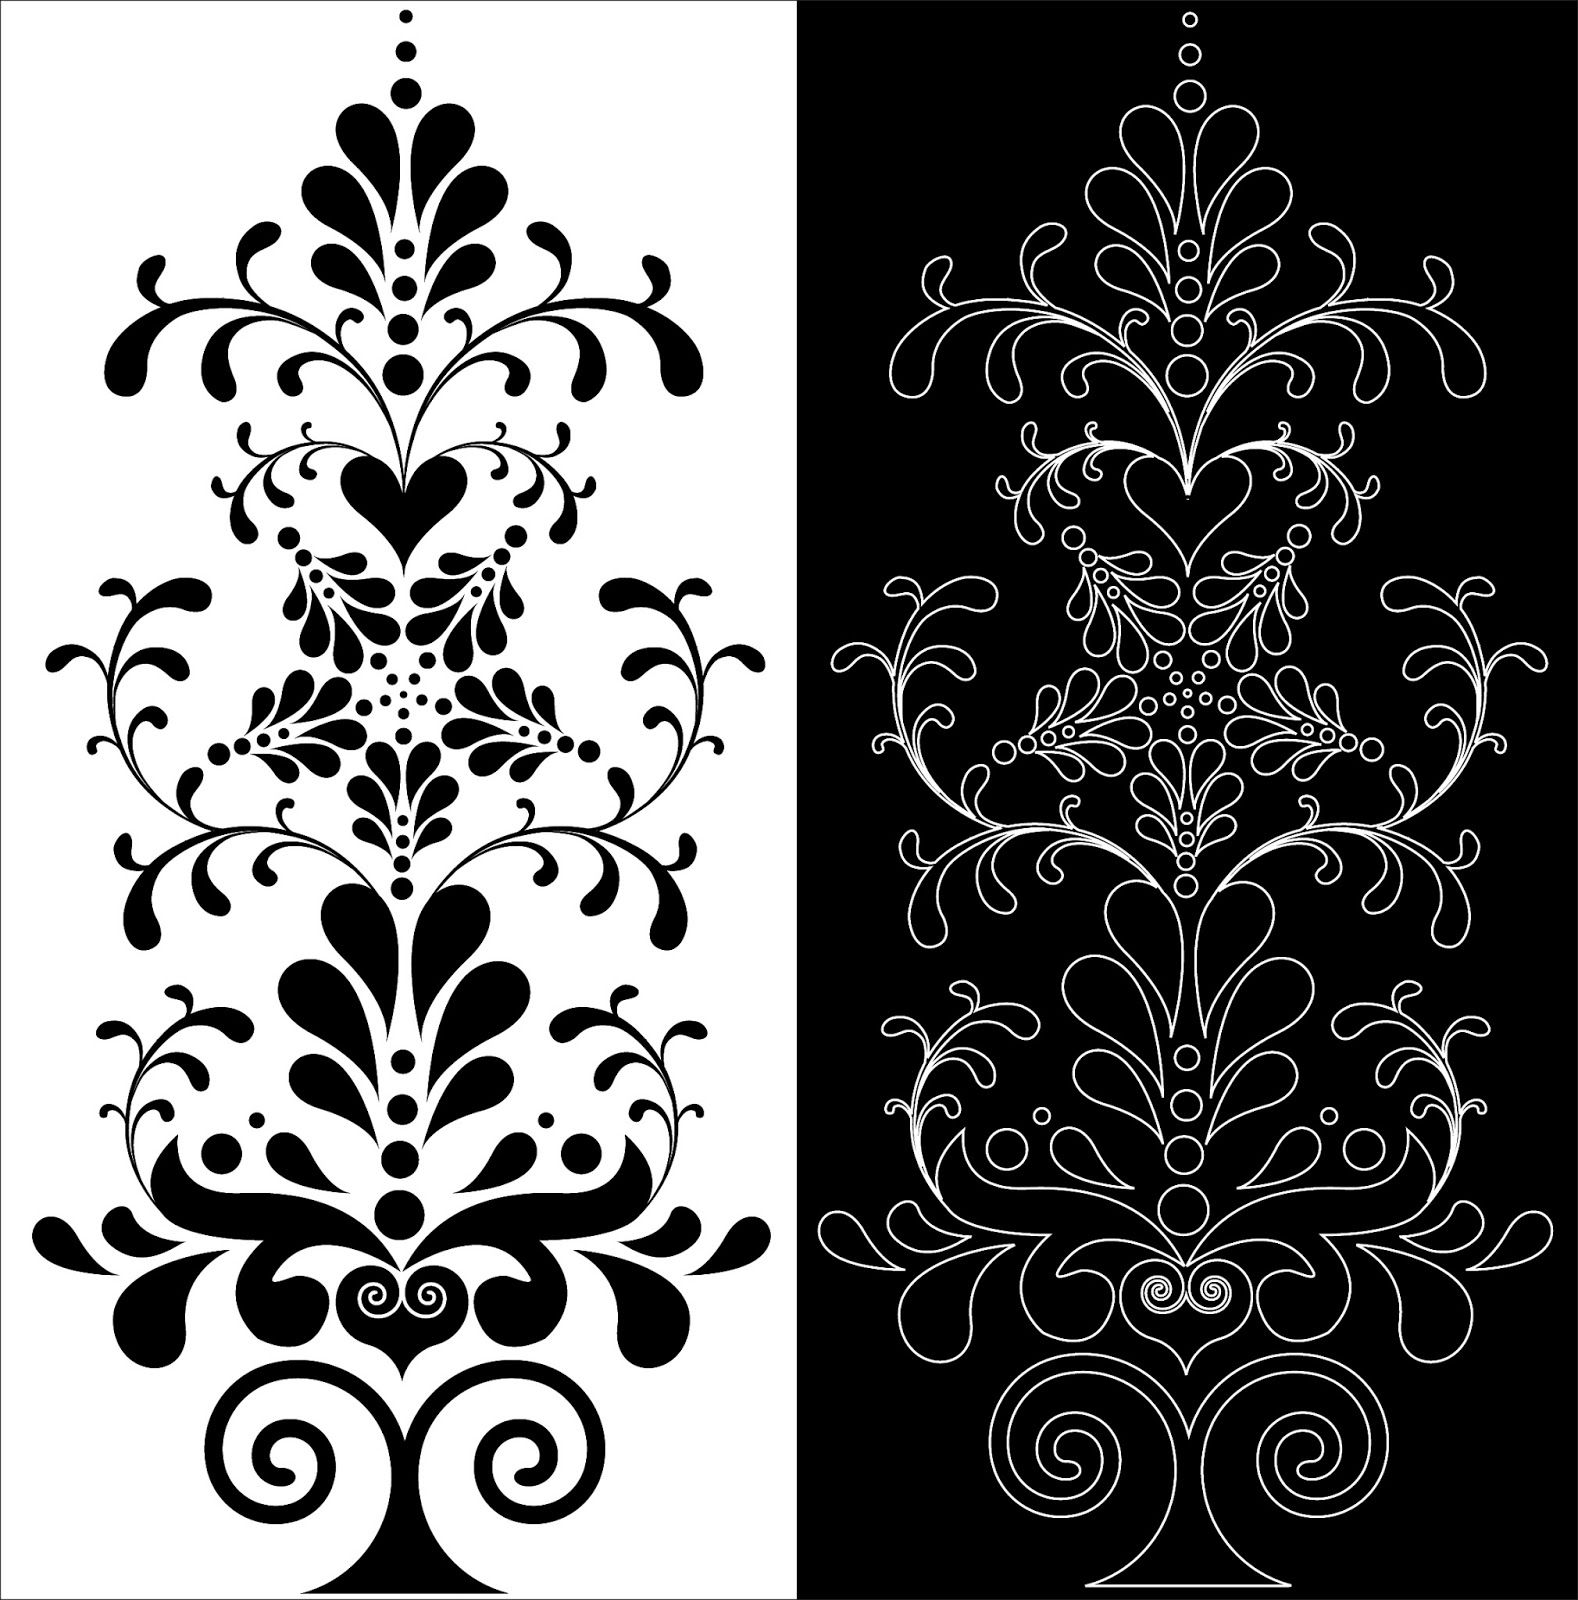 Laser Cut Decorative Floral Pattern Free DXF File